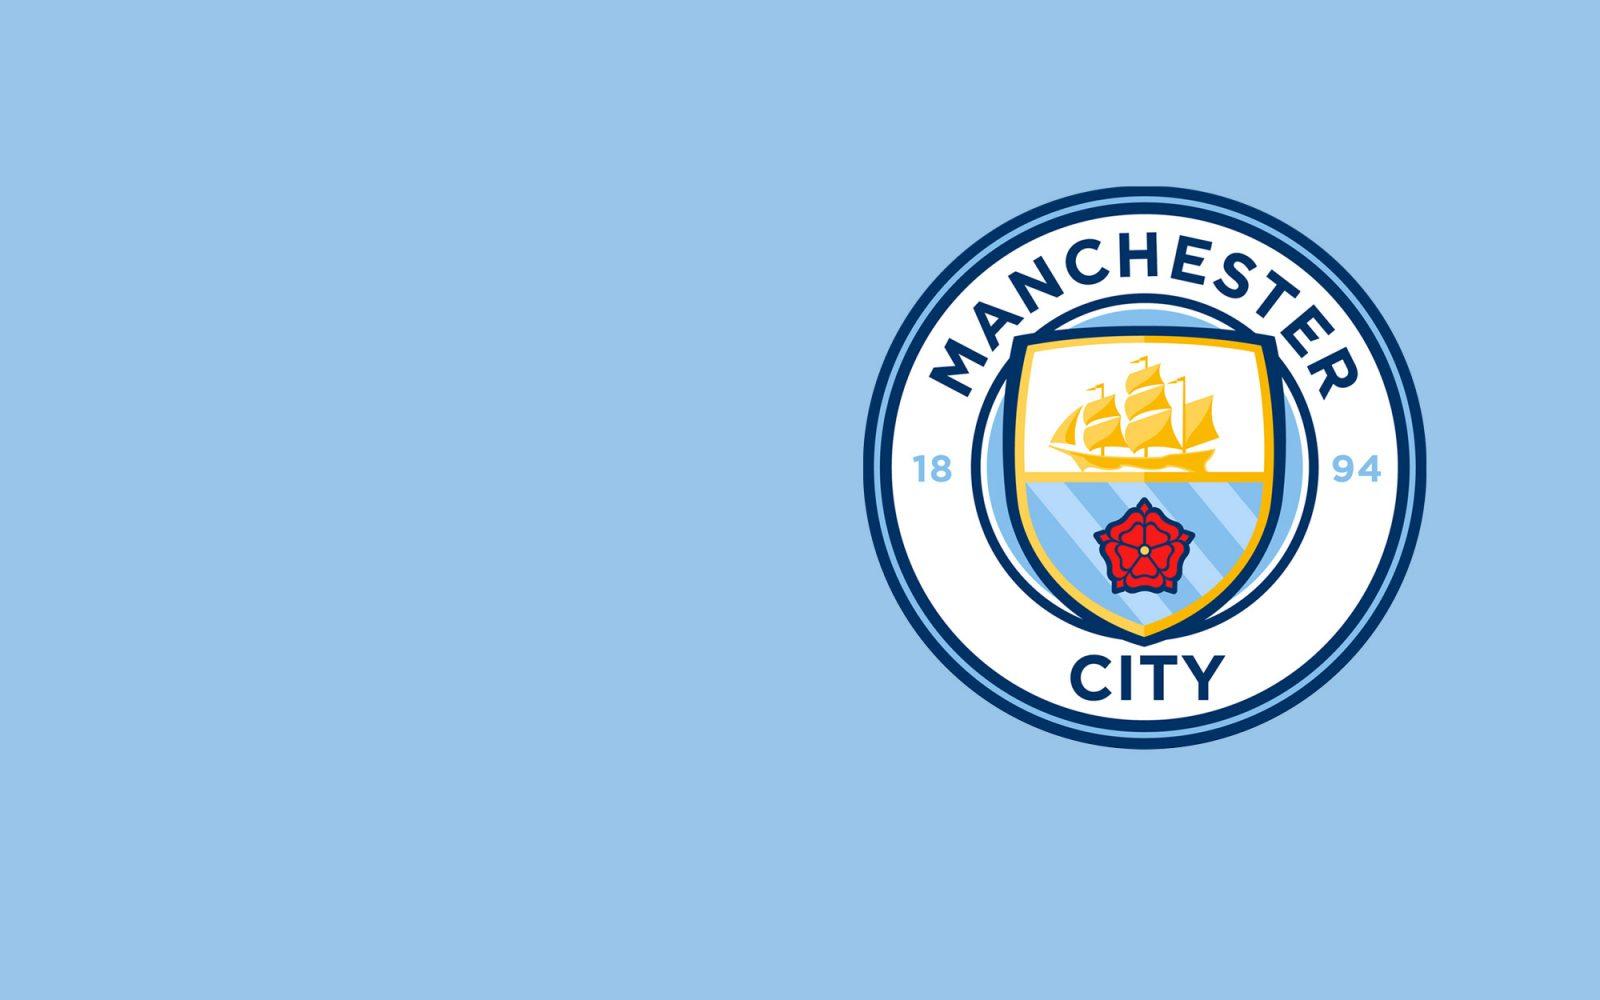 Manchester City Football Club logo on blue background